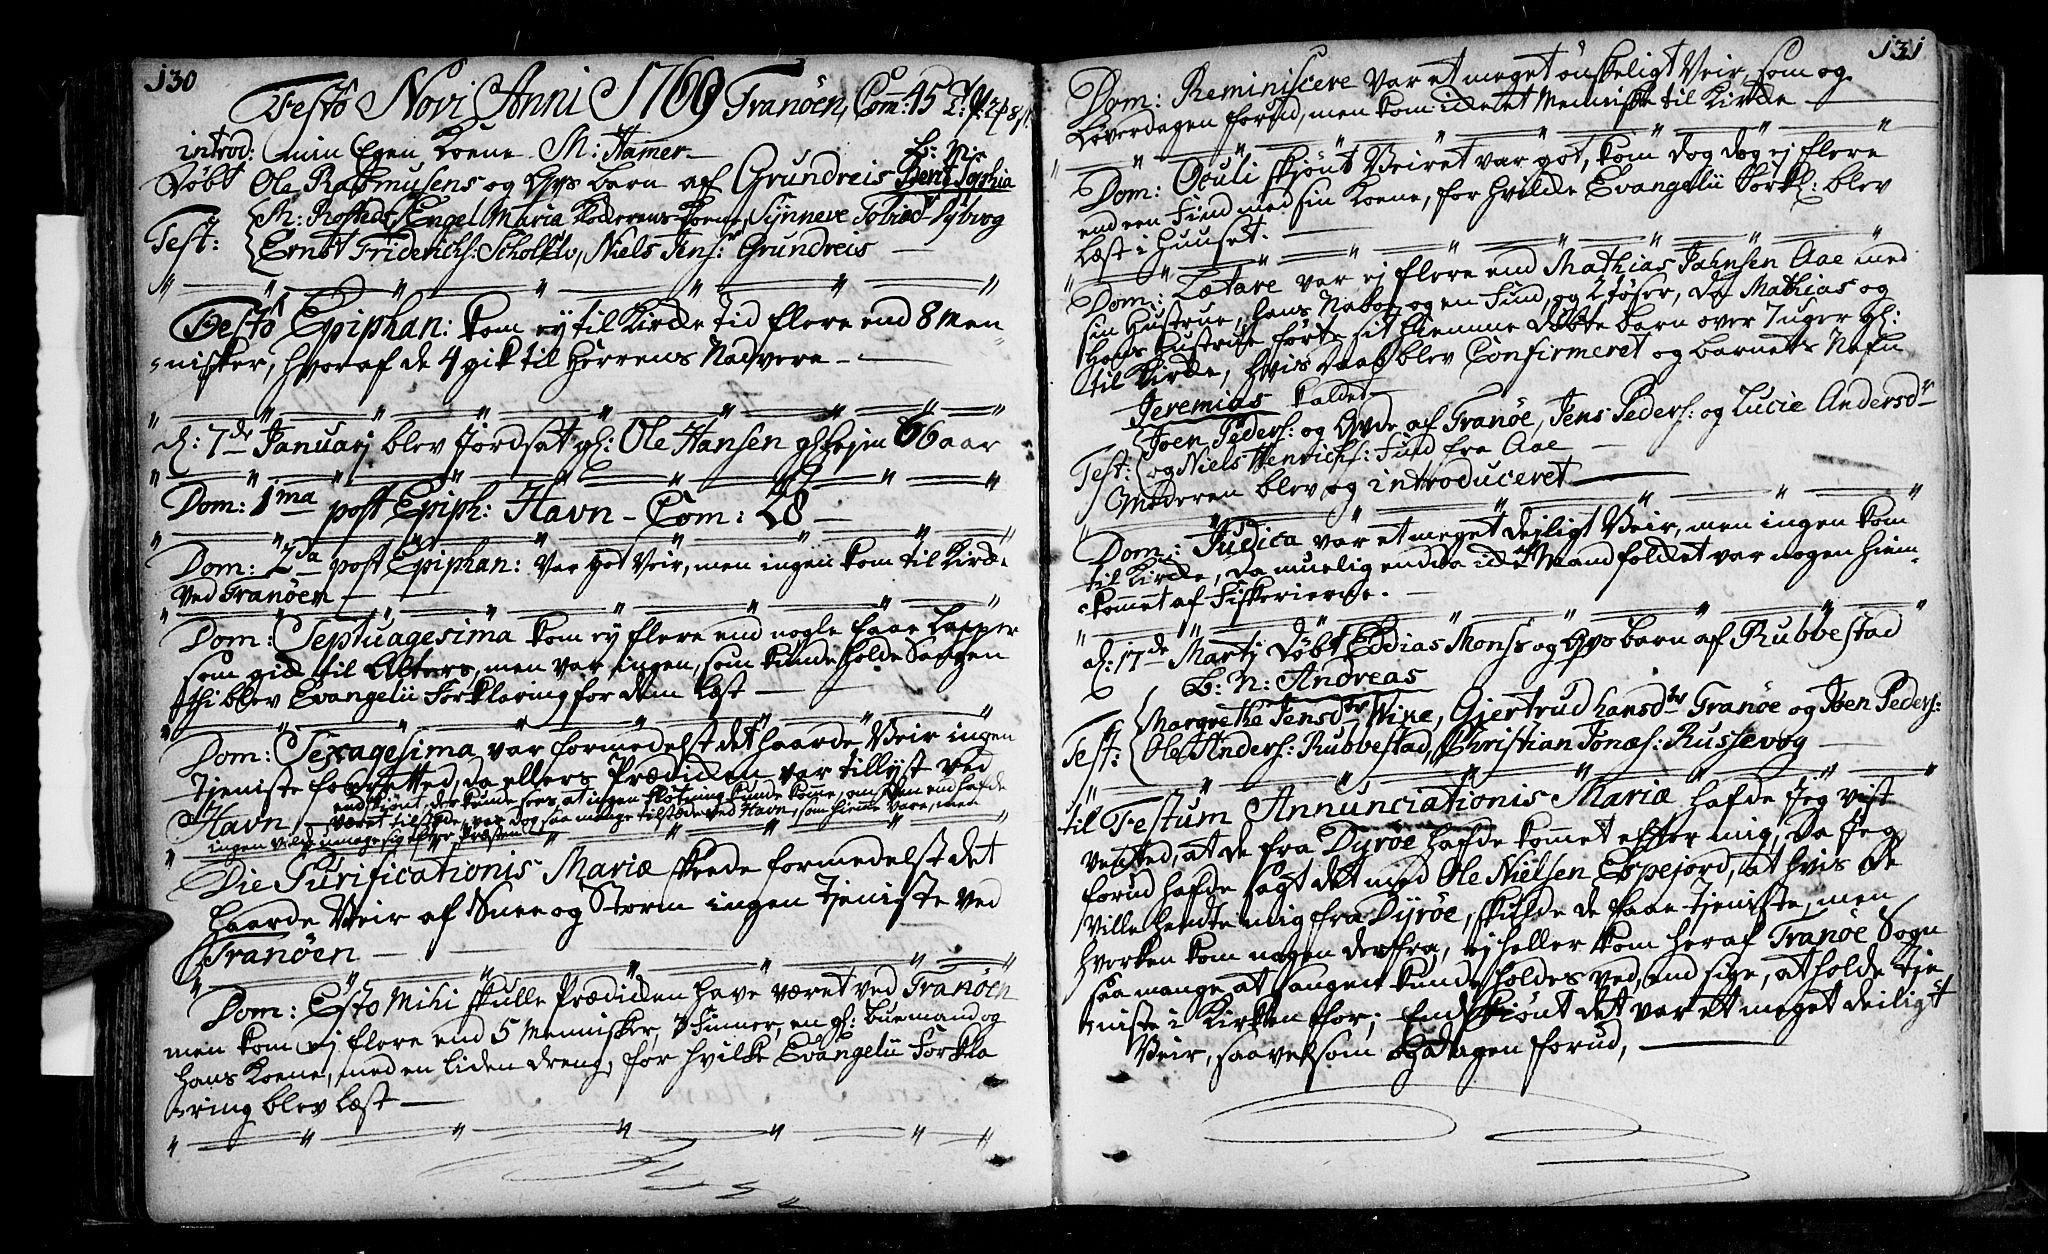 SATØ, Tranøy sokneprestkontor, I/Ia/Iaa/L0001kirke: Ministerialbok nr. 1, 1757-1773, s. 130-131